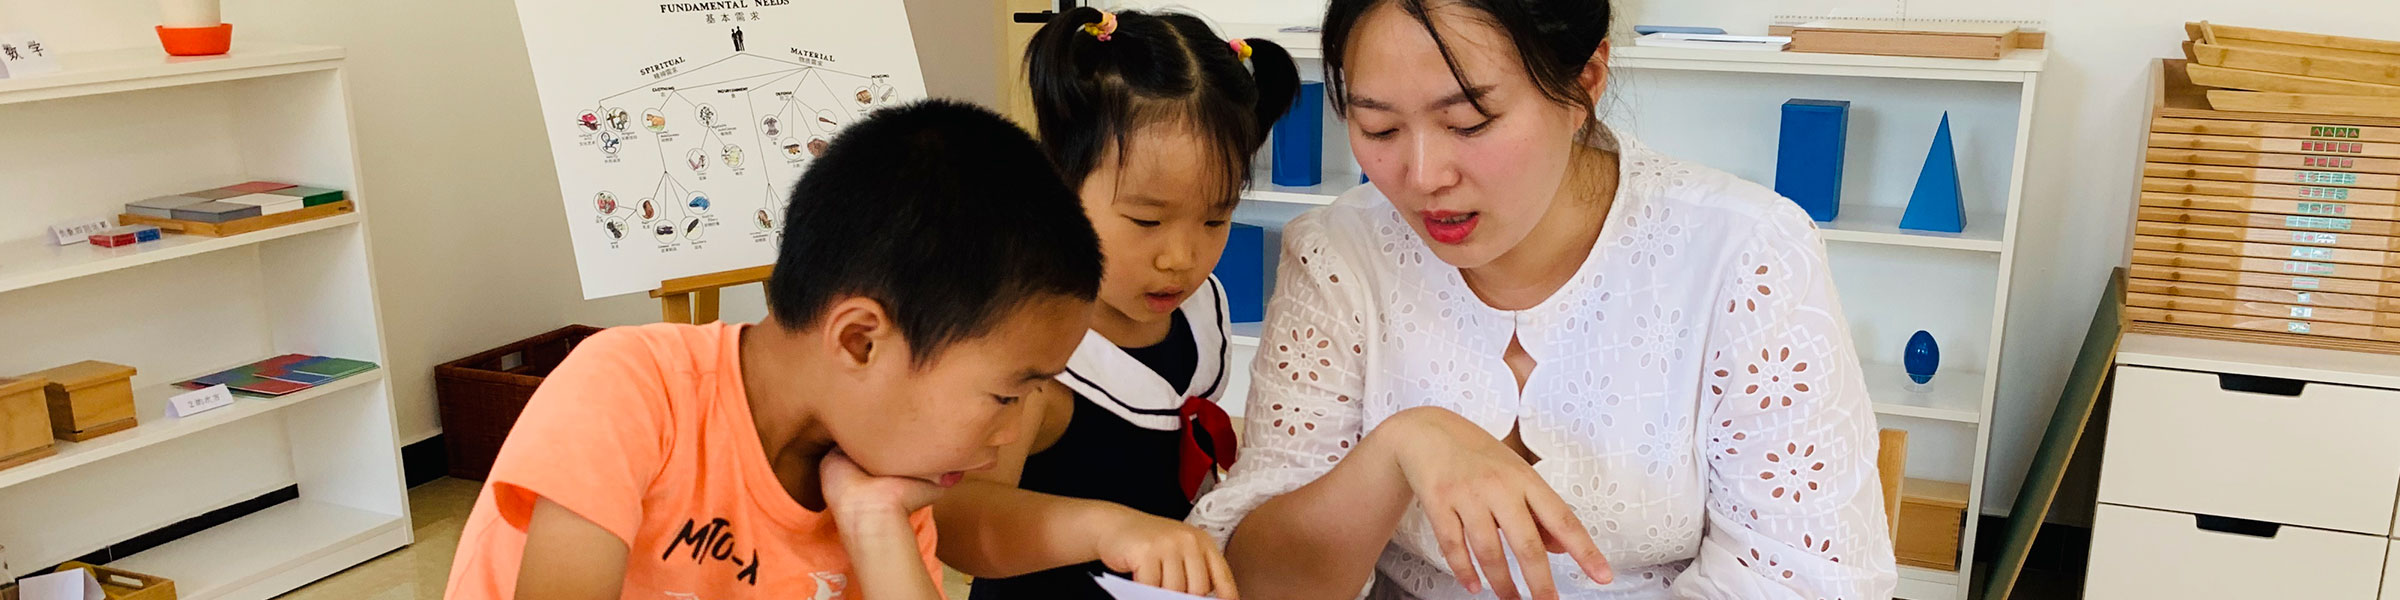 Montessori teacher and children